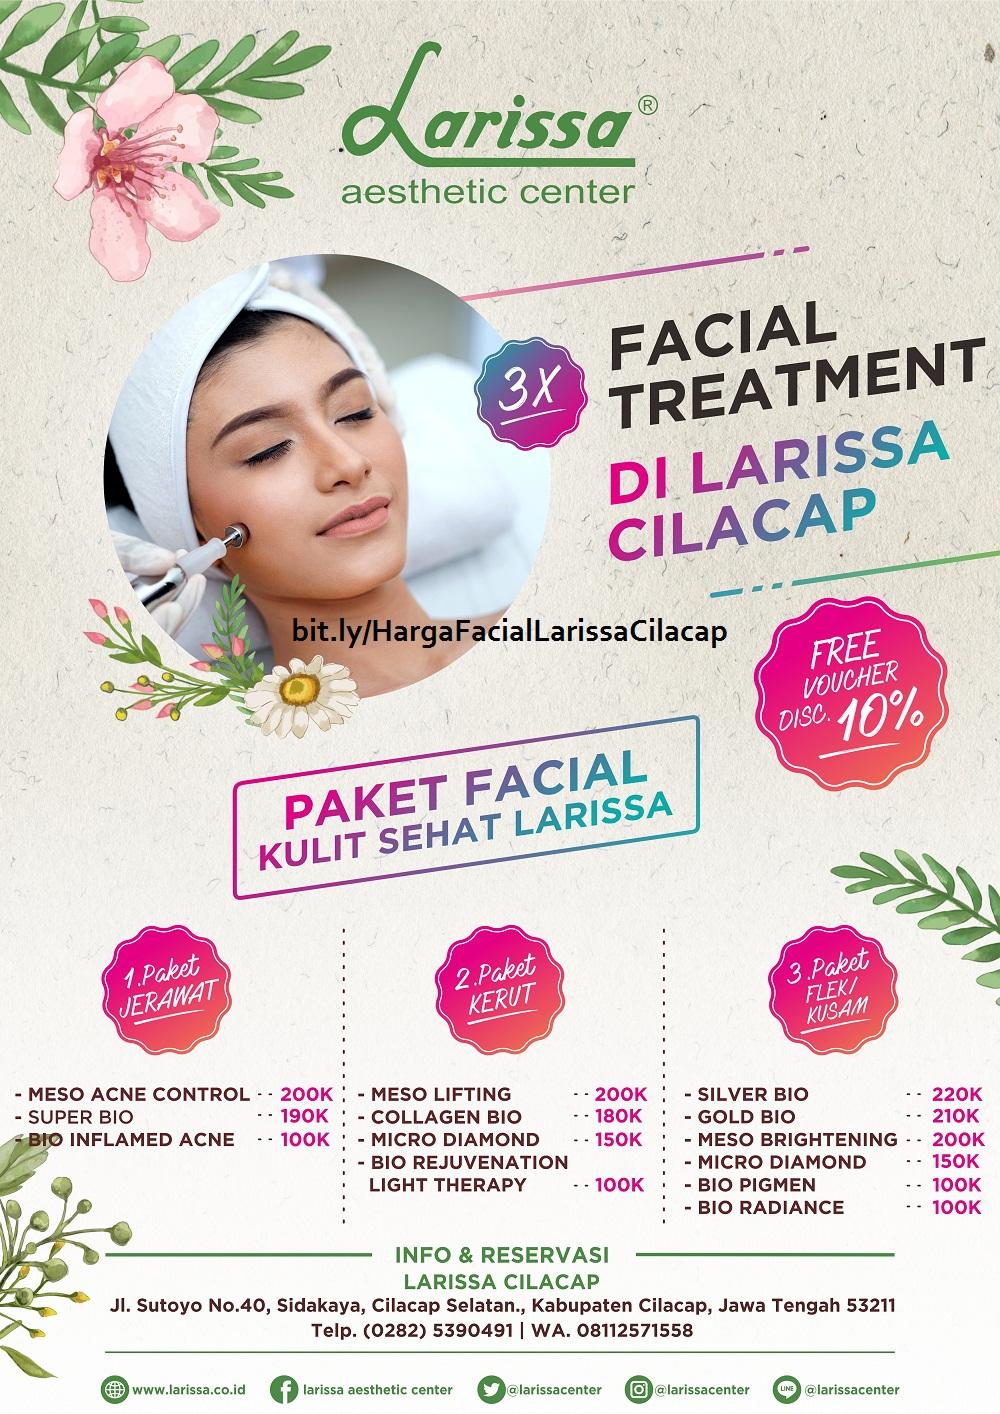 Daftar Harga Facial Treatment di Larissa Cilacap